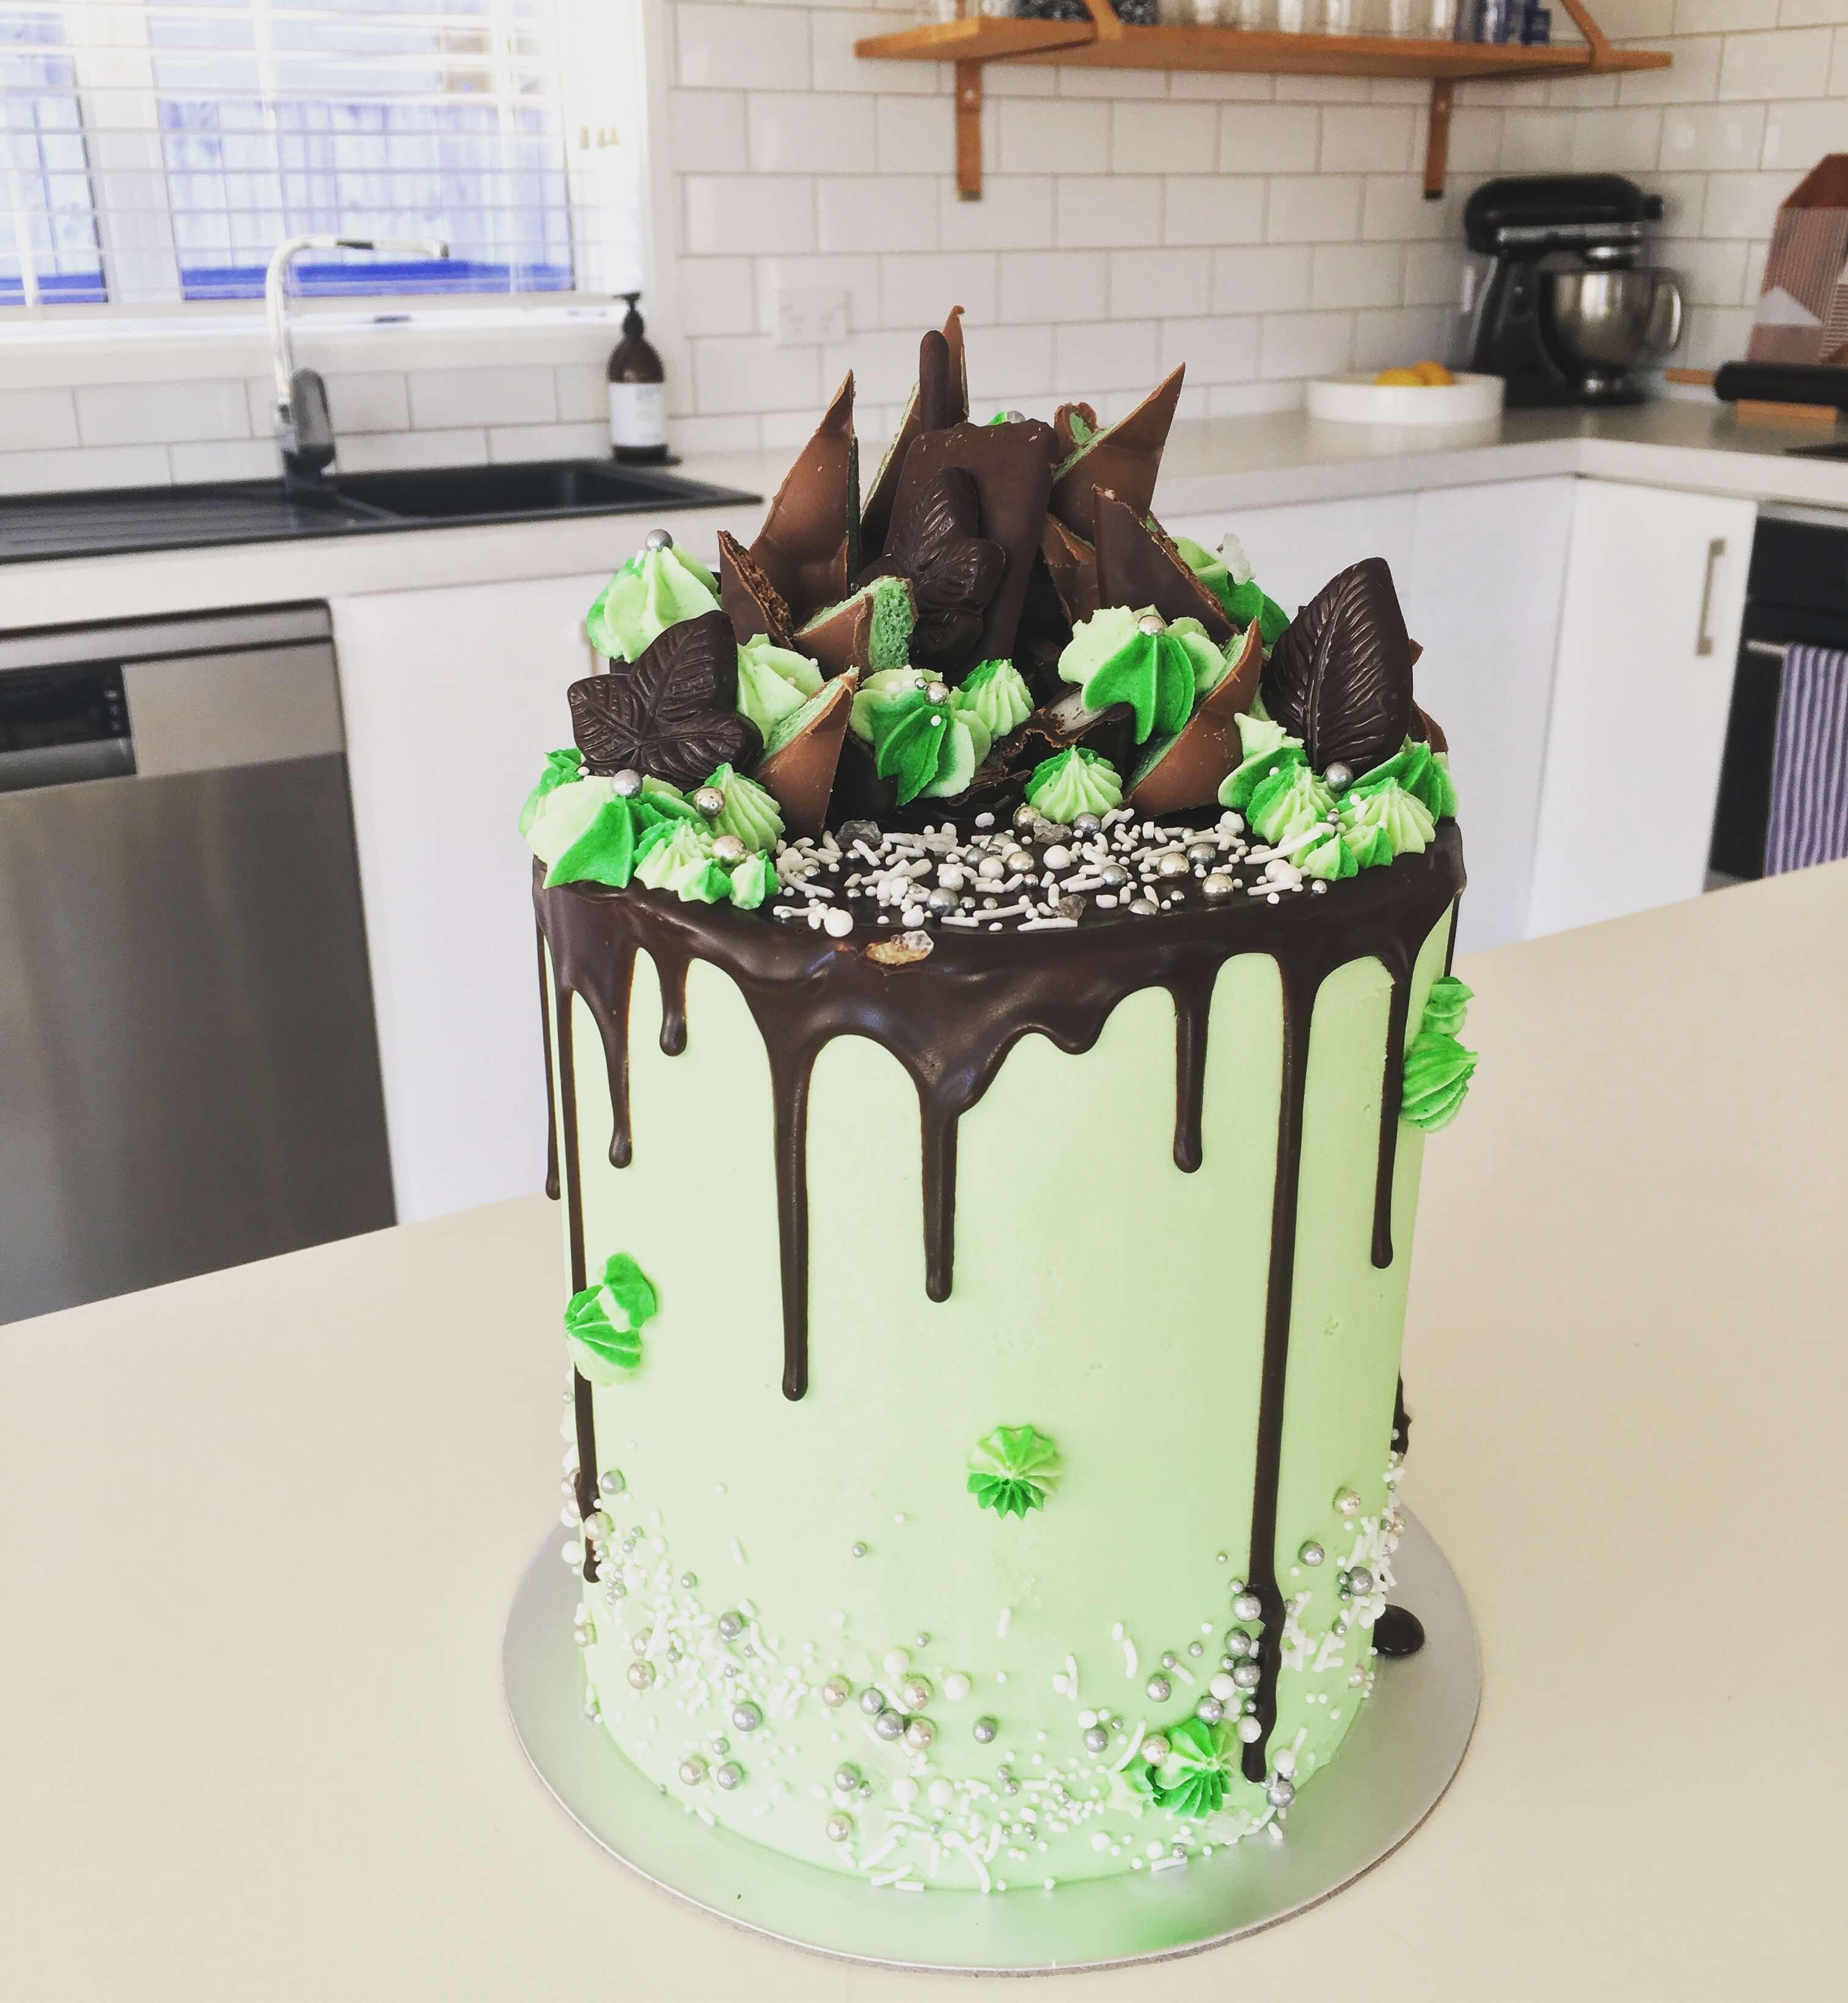 incredible cakes by duke of sugar 16 (1)